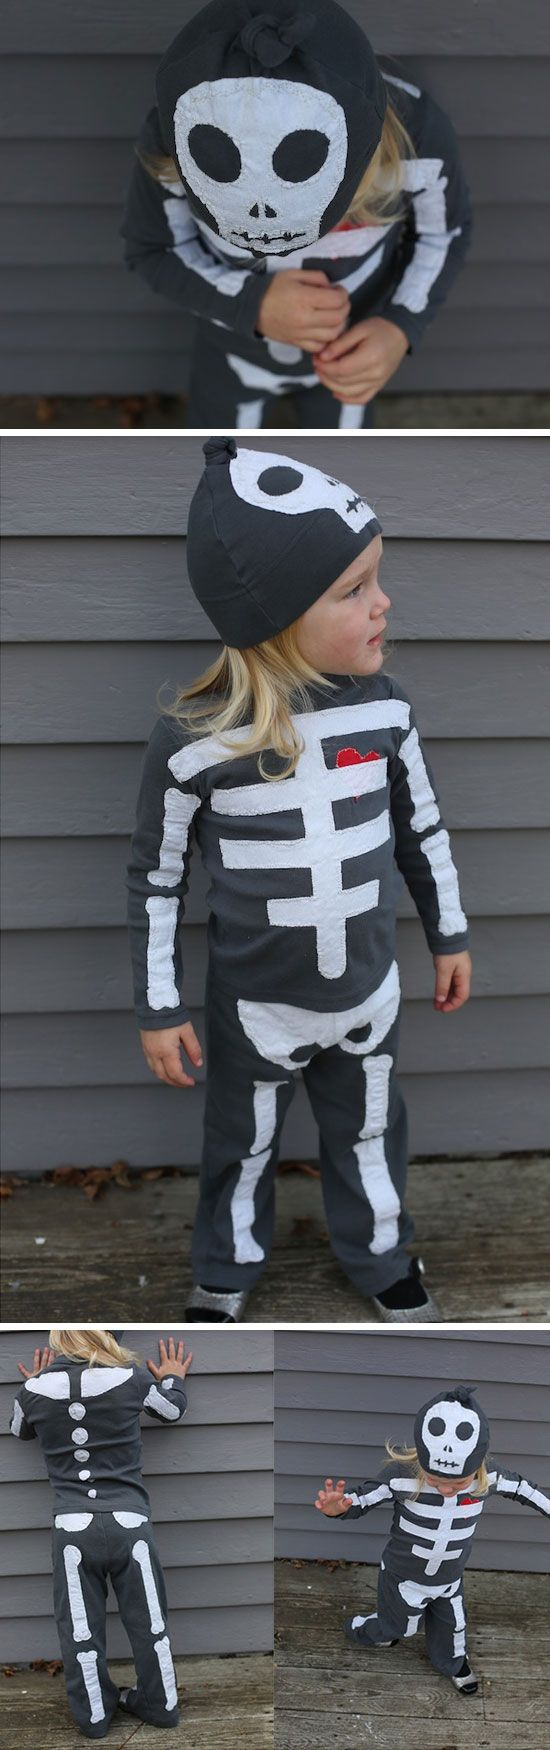 skeleton costume click for 30 diy halloween costumes for kids to make diy halloween costumes for toddlers provestra